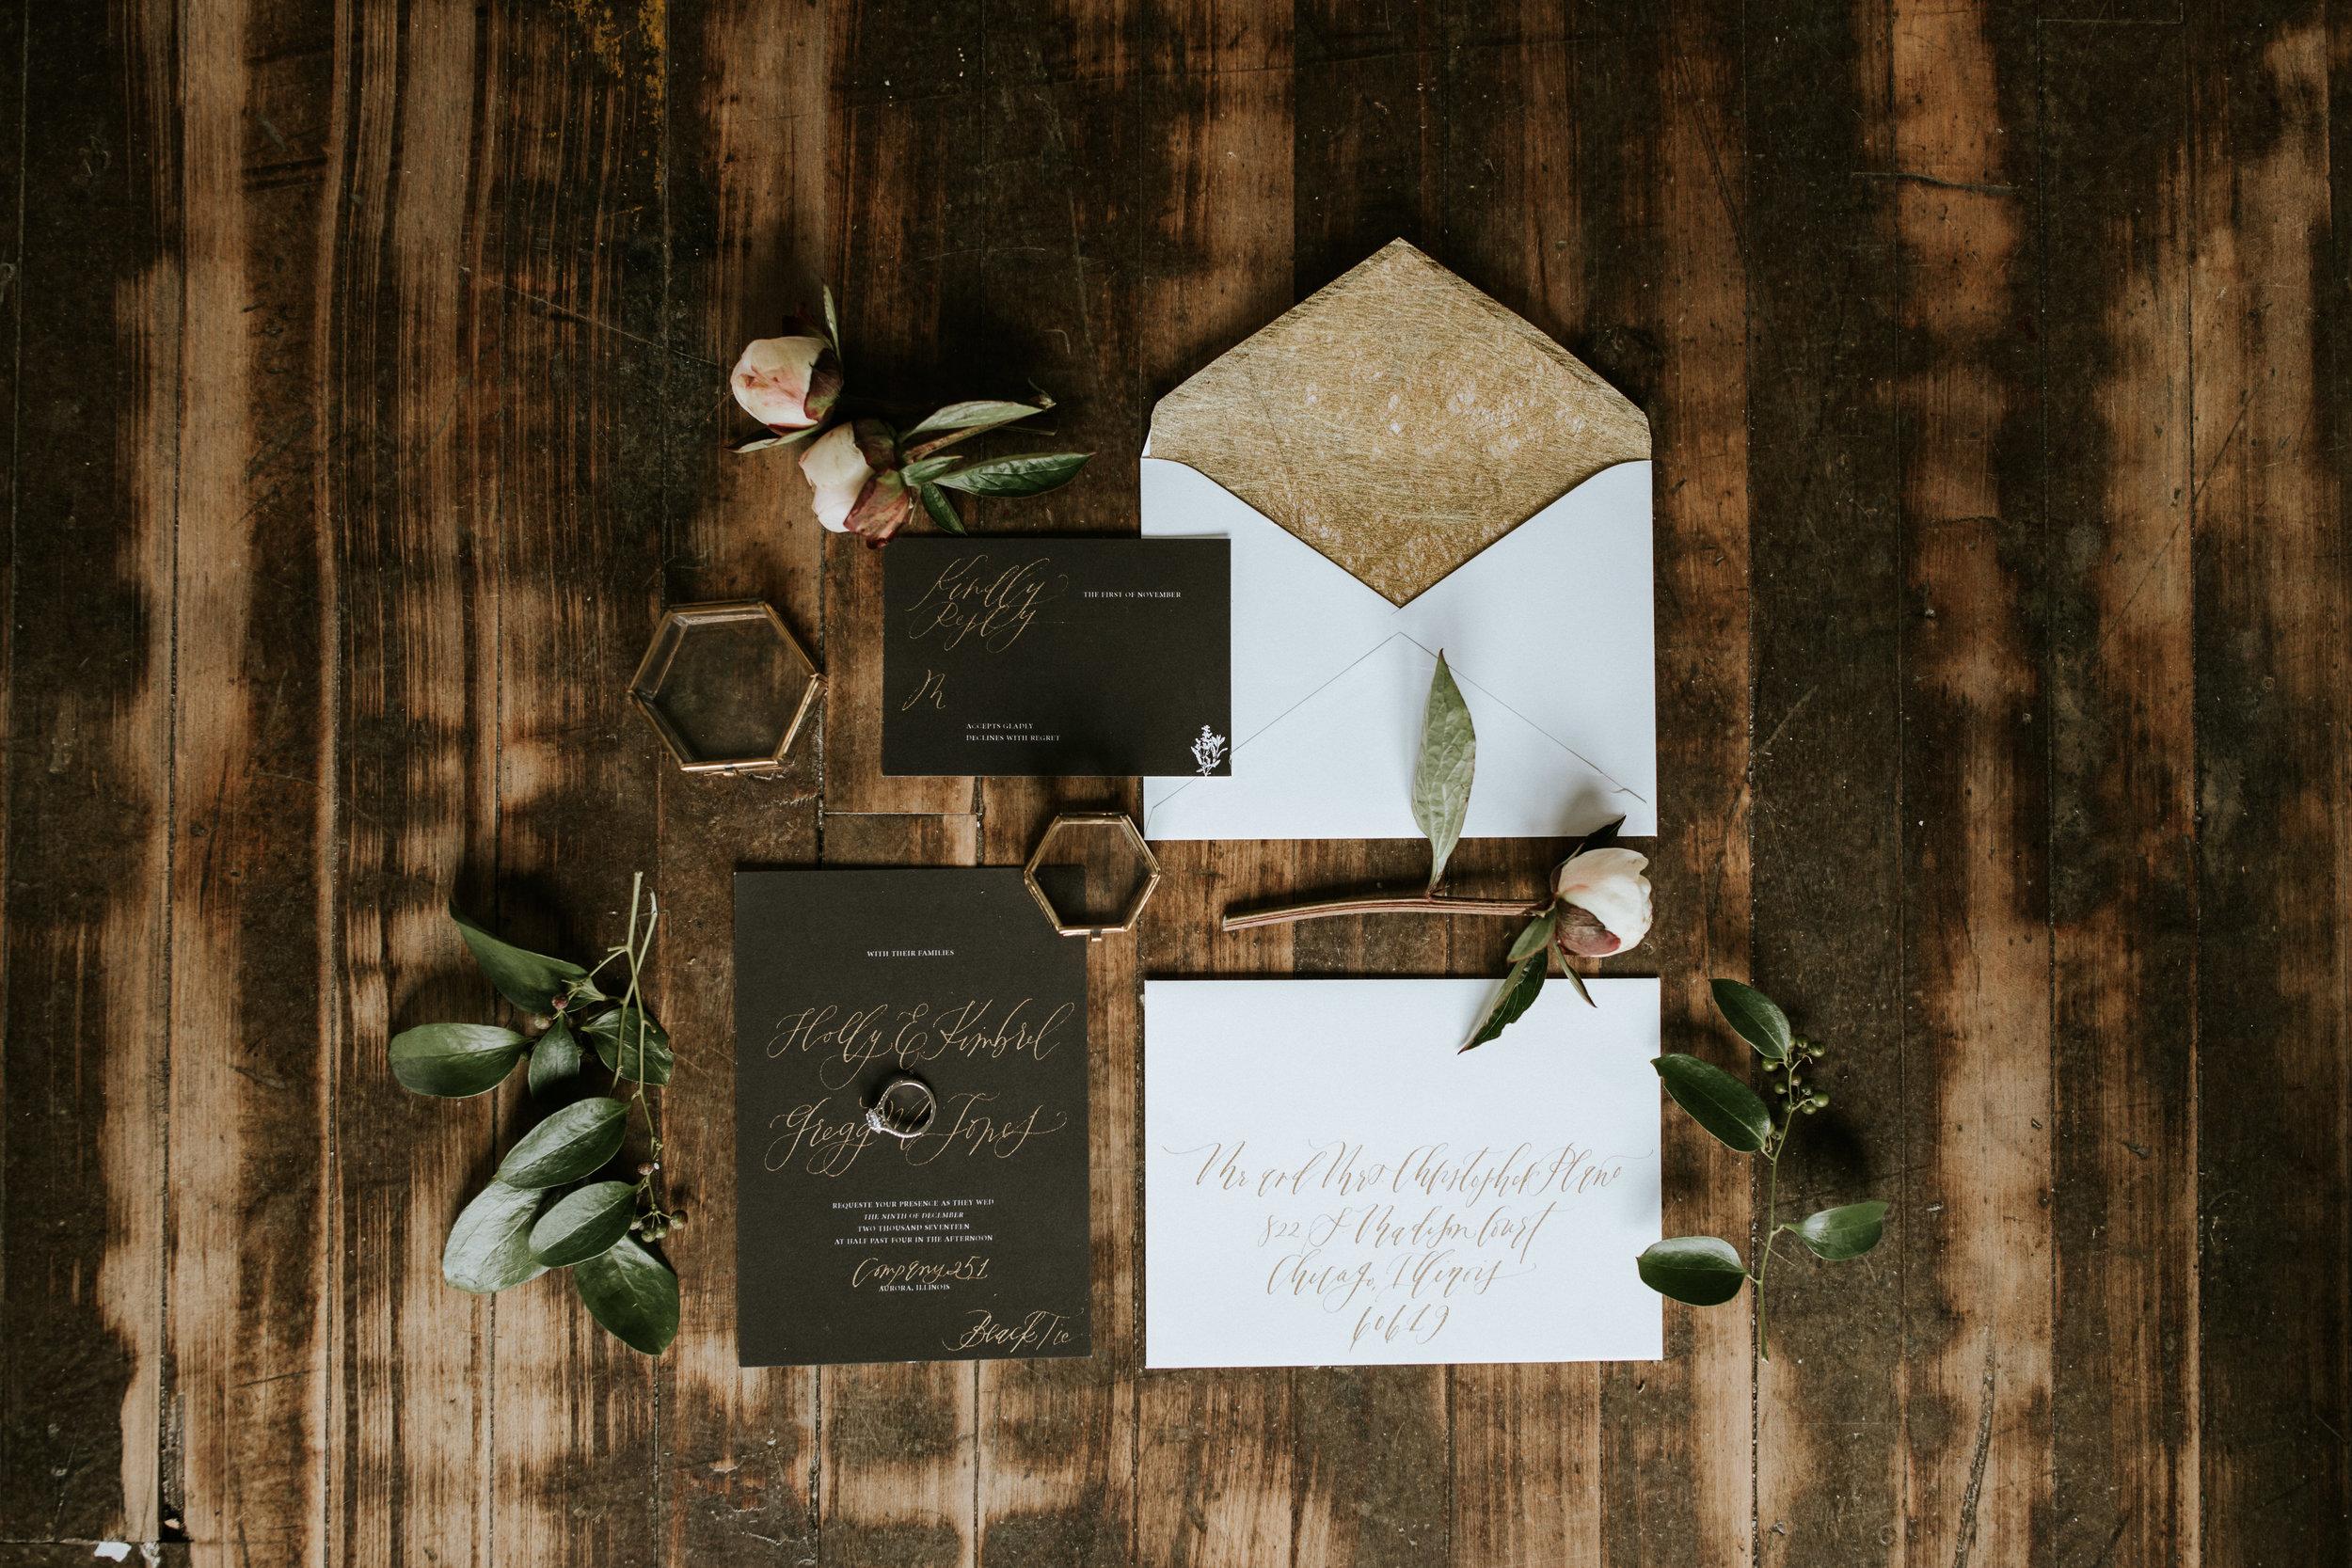 company-251-wedding-shoot-full-resolution-007.jpg